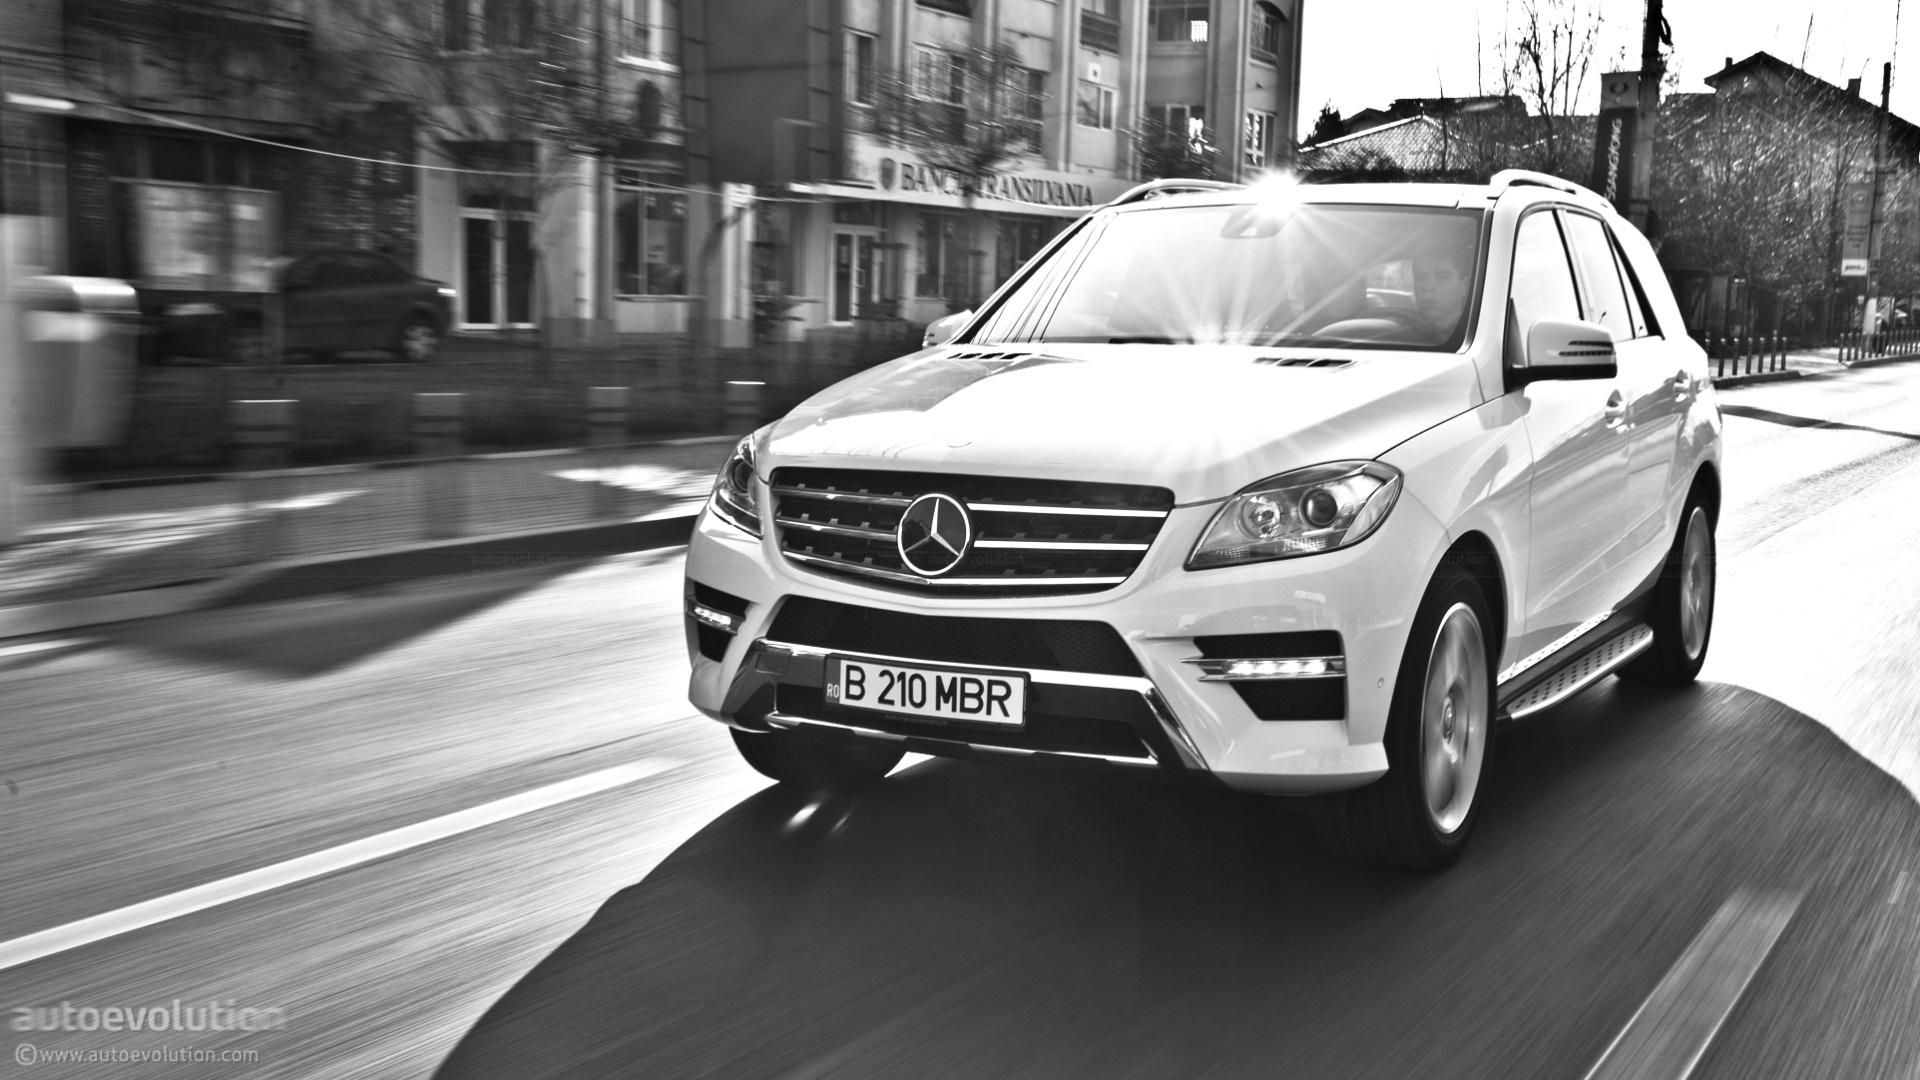 Mercedes benz ml350 review autoevolution for Auto mercedes benz